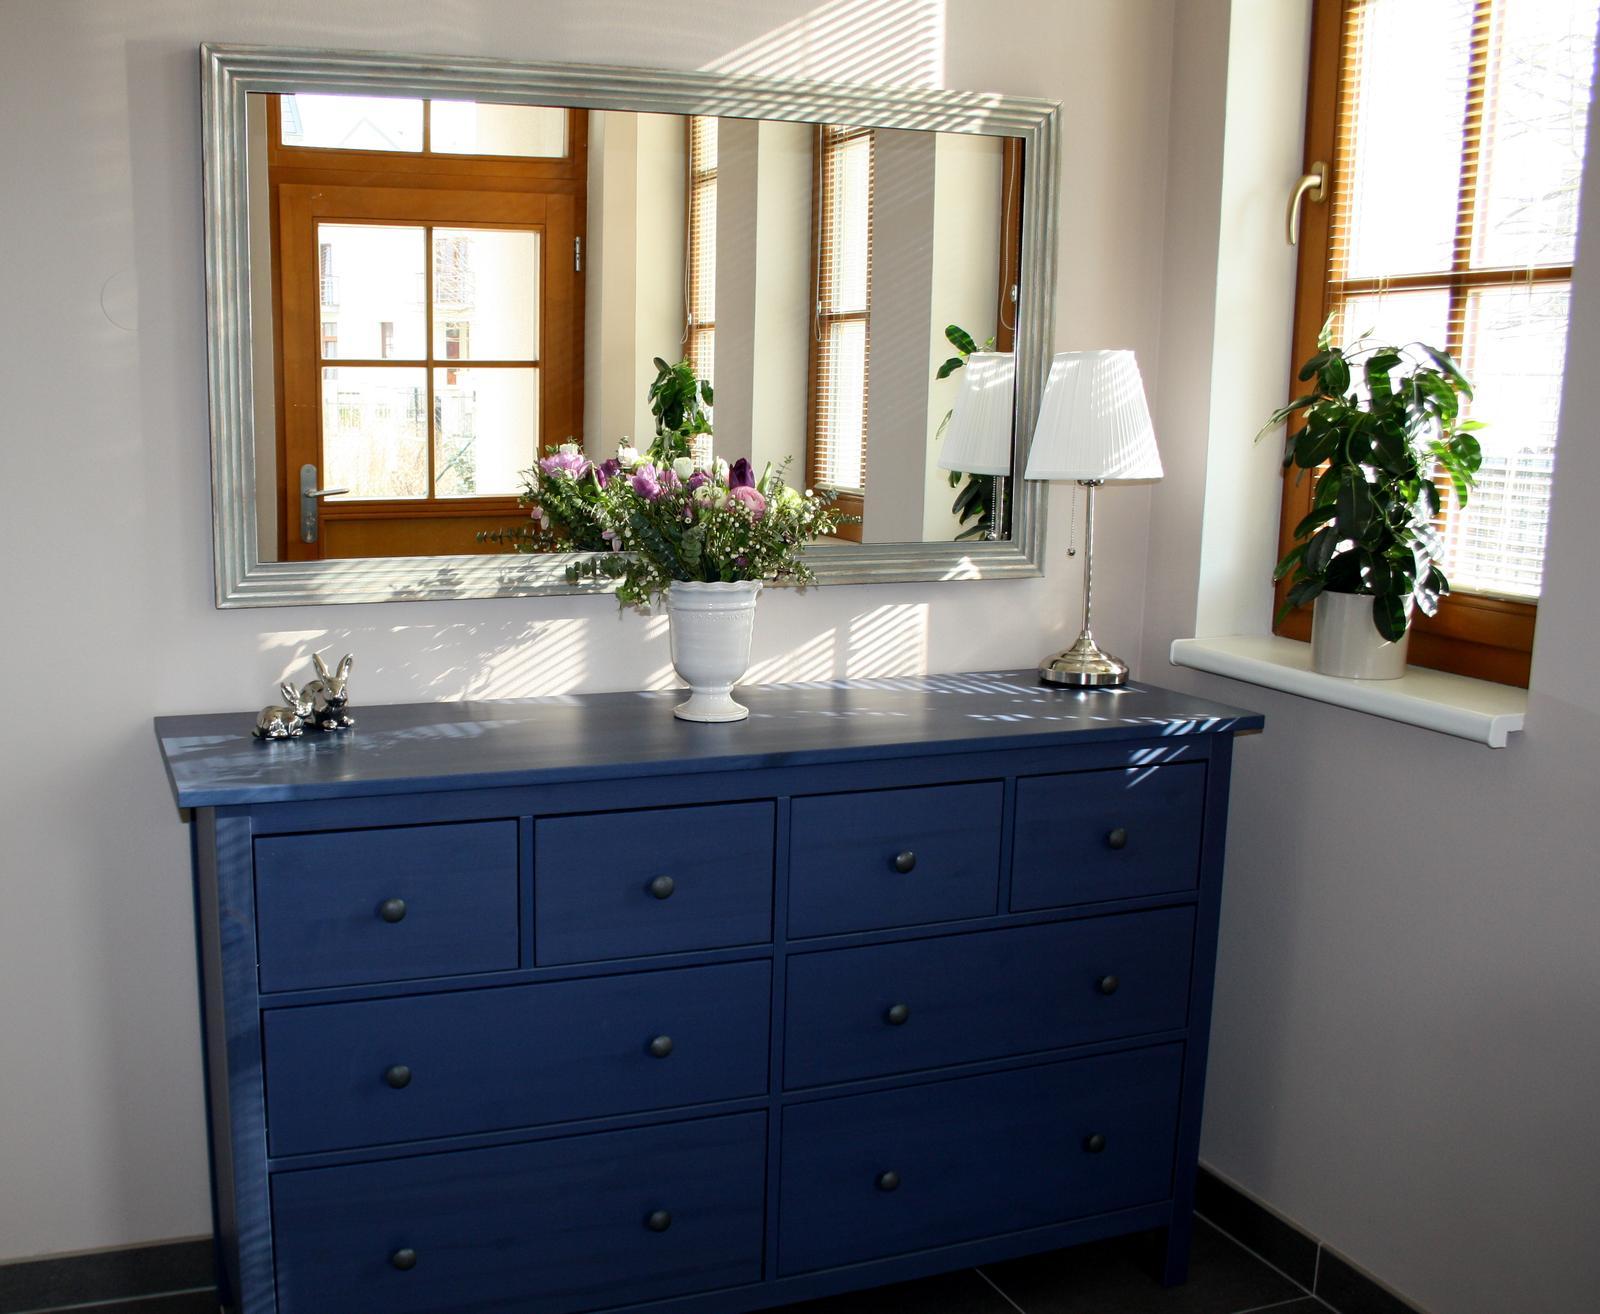 Jarne a letne aranzmany a dekoracie - Jednoducha dekoracia vstupnej chodby s doma vyrobenym aranzmanom